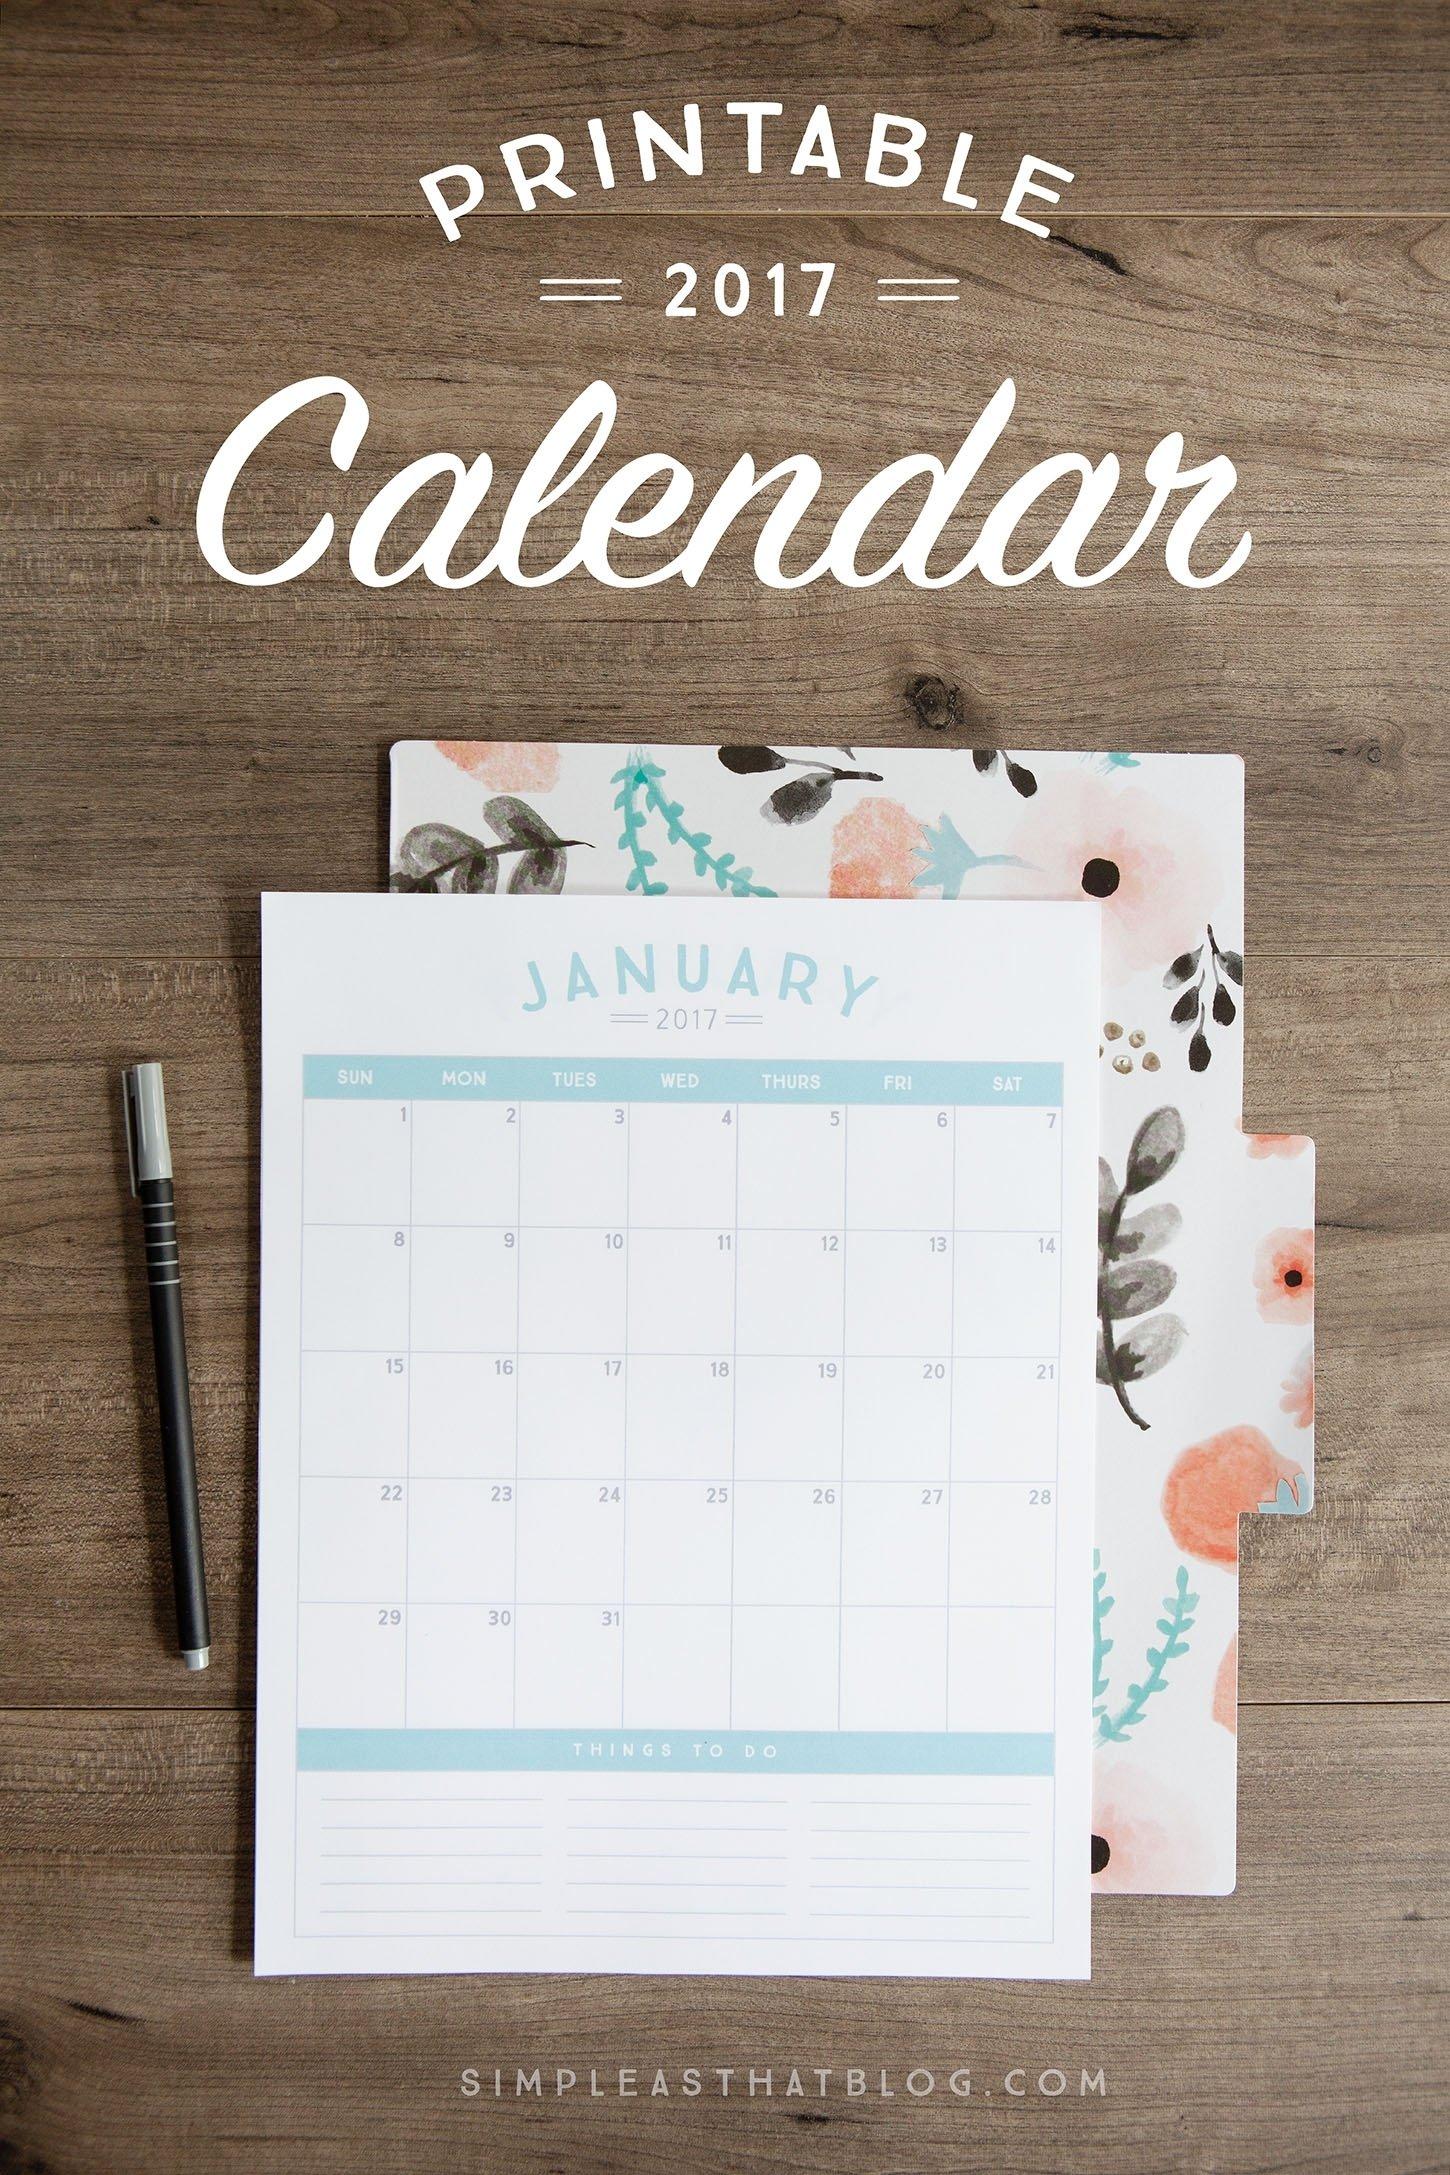 Free Printable Short Timers Calendar | Calendar Template 2020 Create A Short Timers Calender